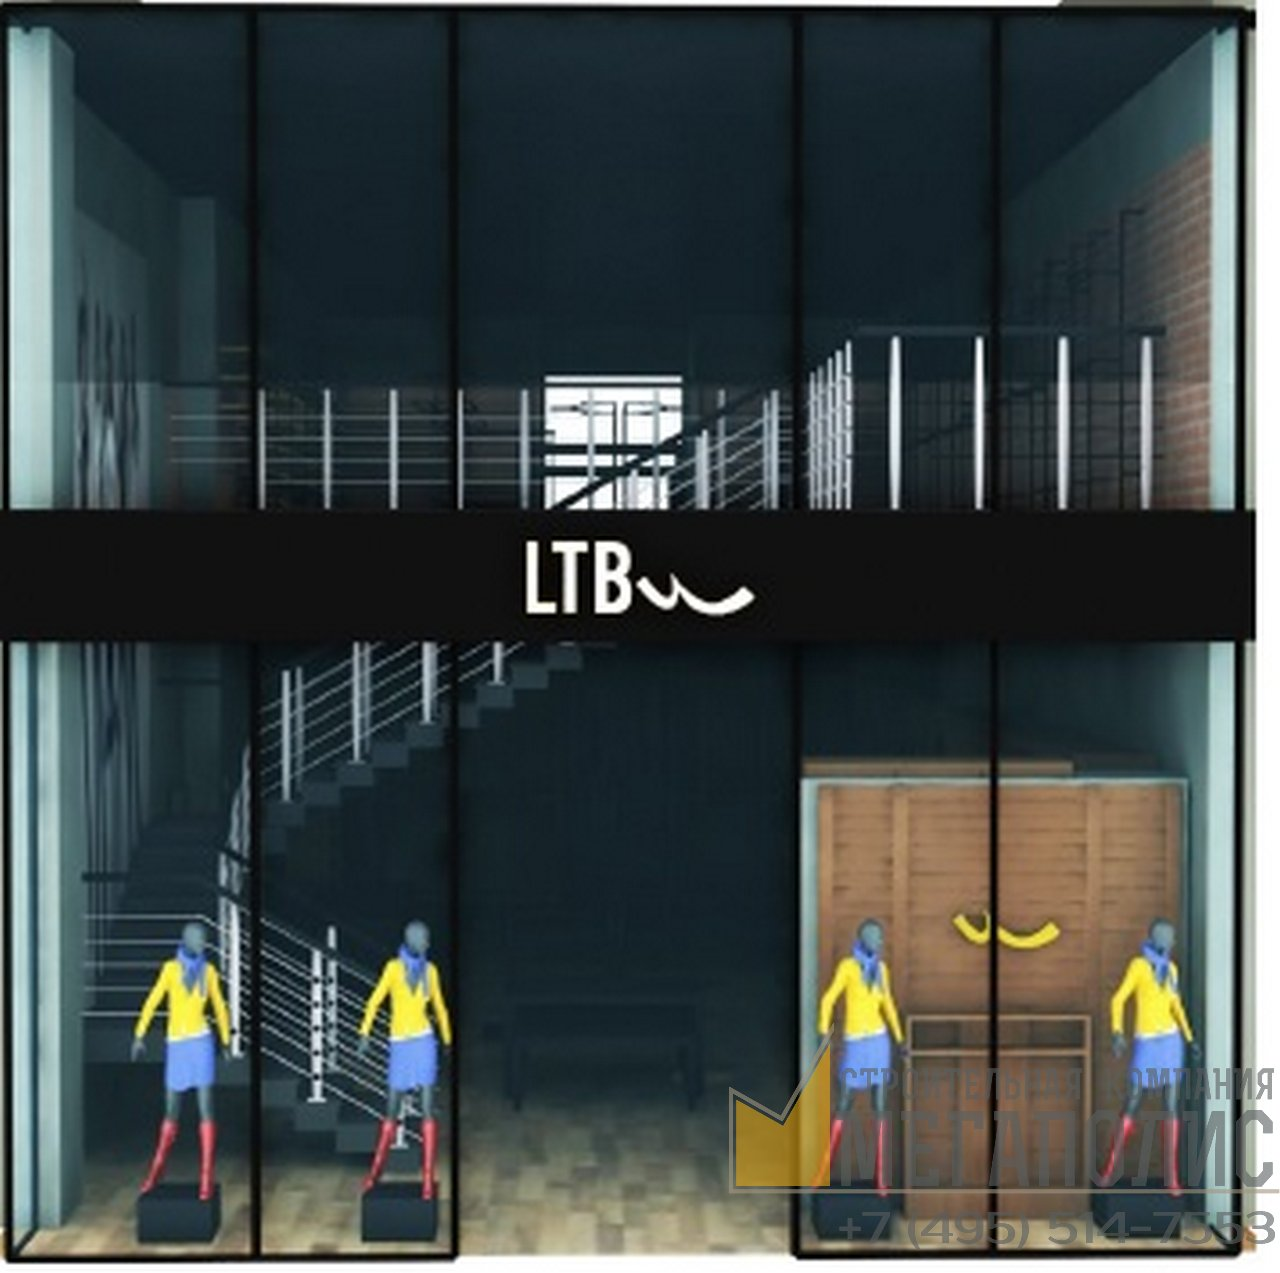 LTB_моремолл_004